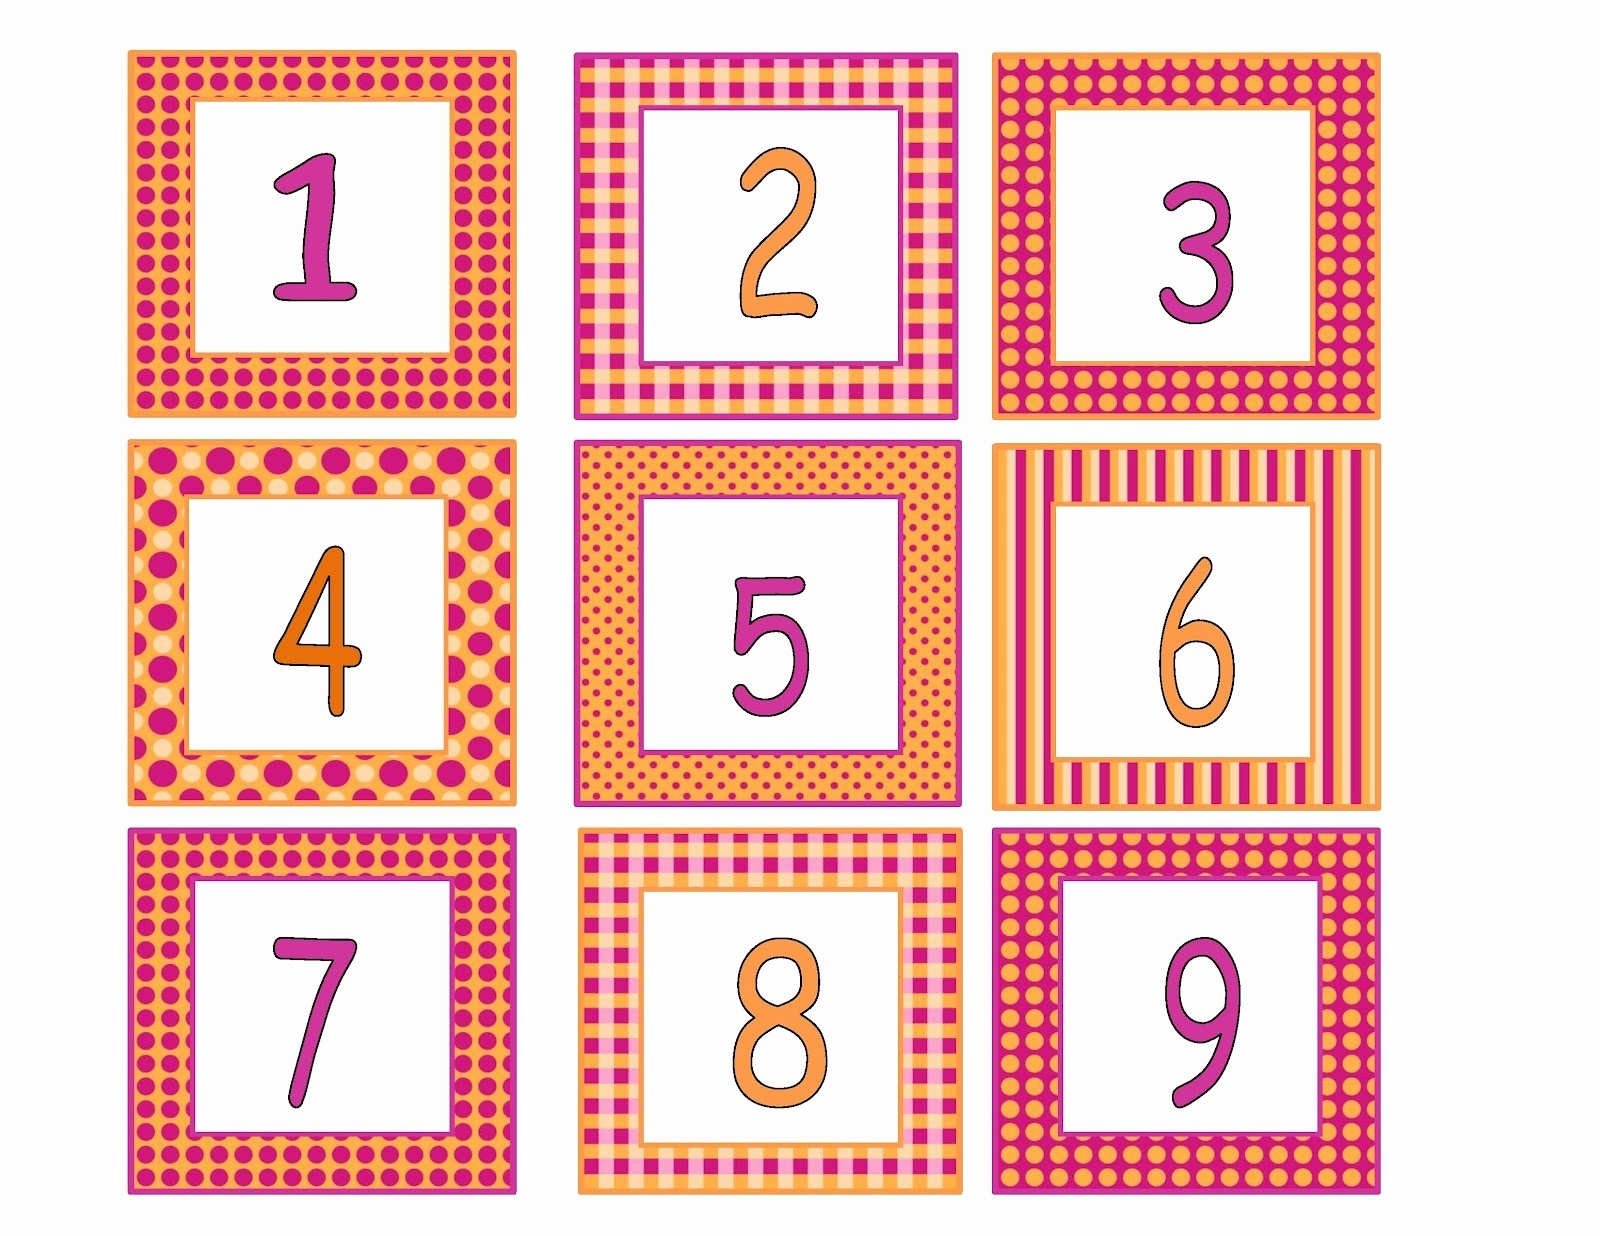 Https://www.basketshoescenter/33-Kid-Calendar-2019-Printable Extraordinary Printable Calendar Numbers For Preschool